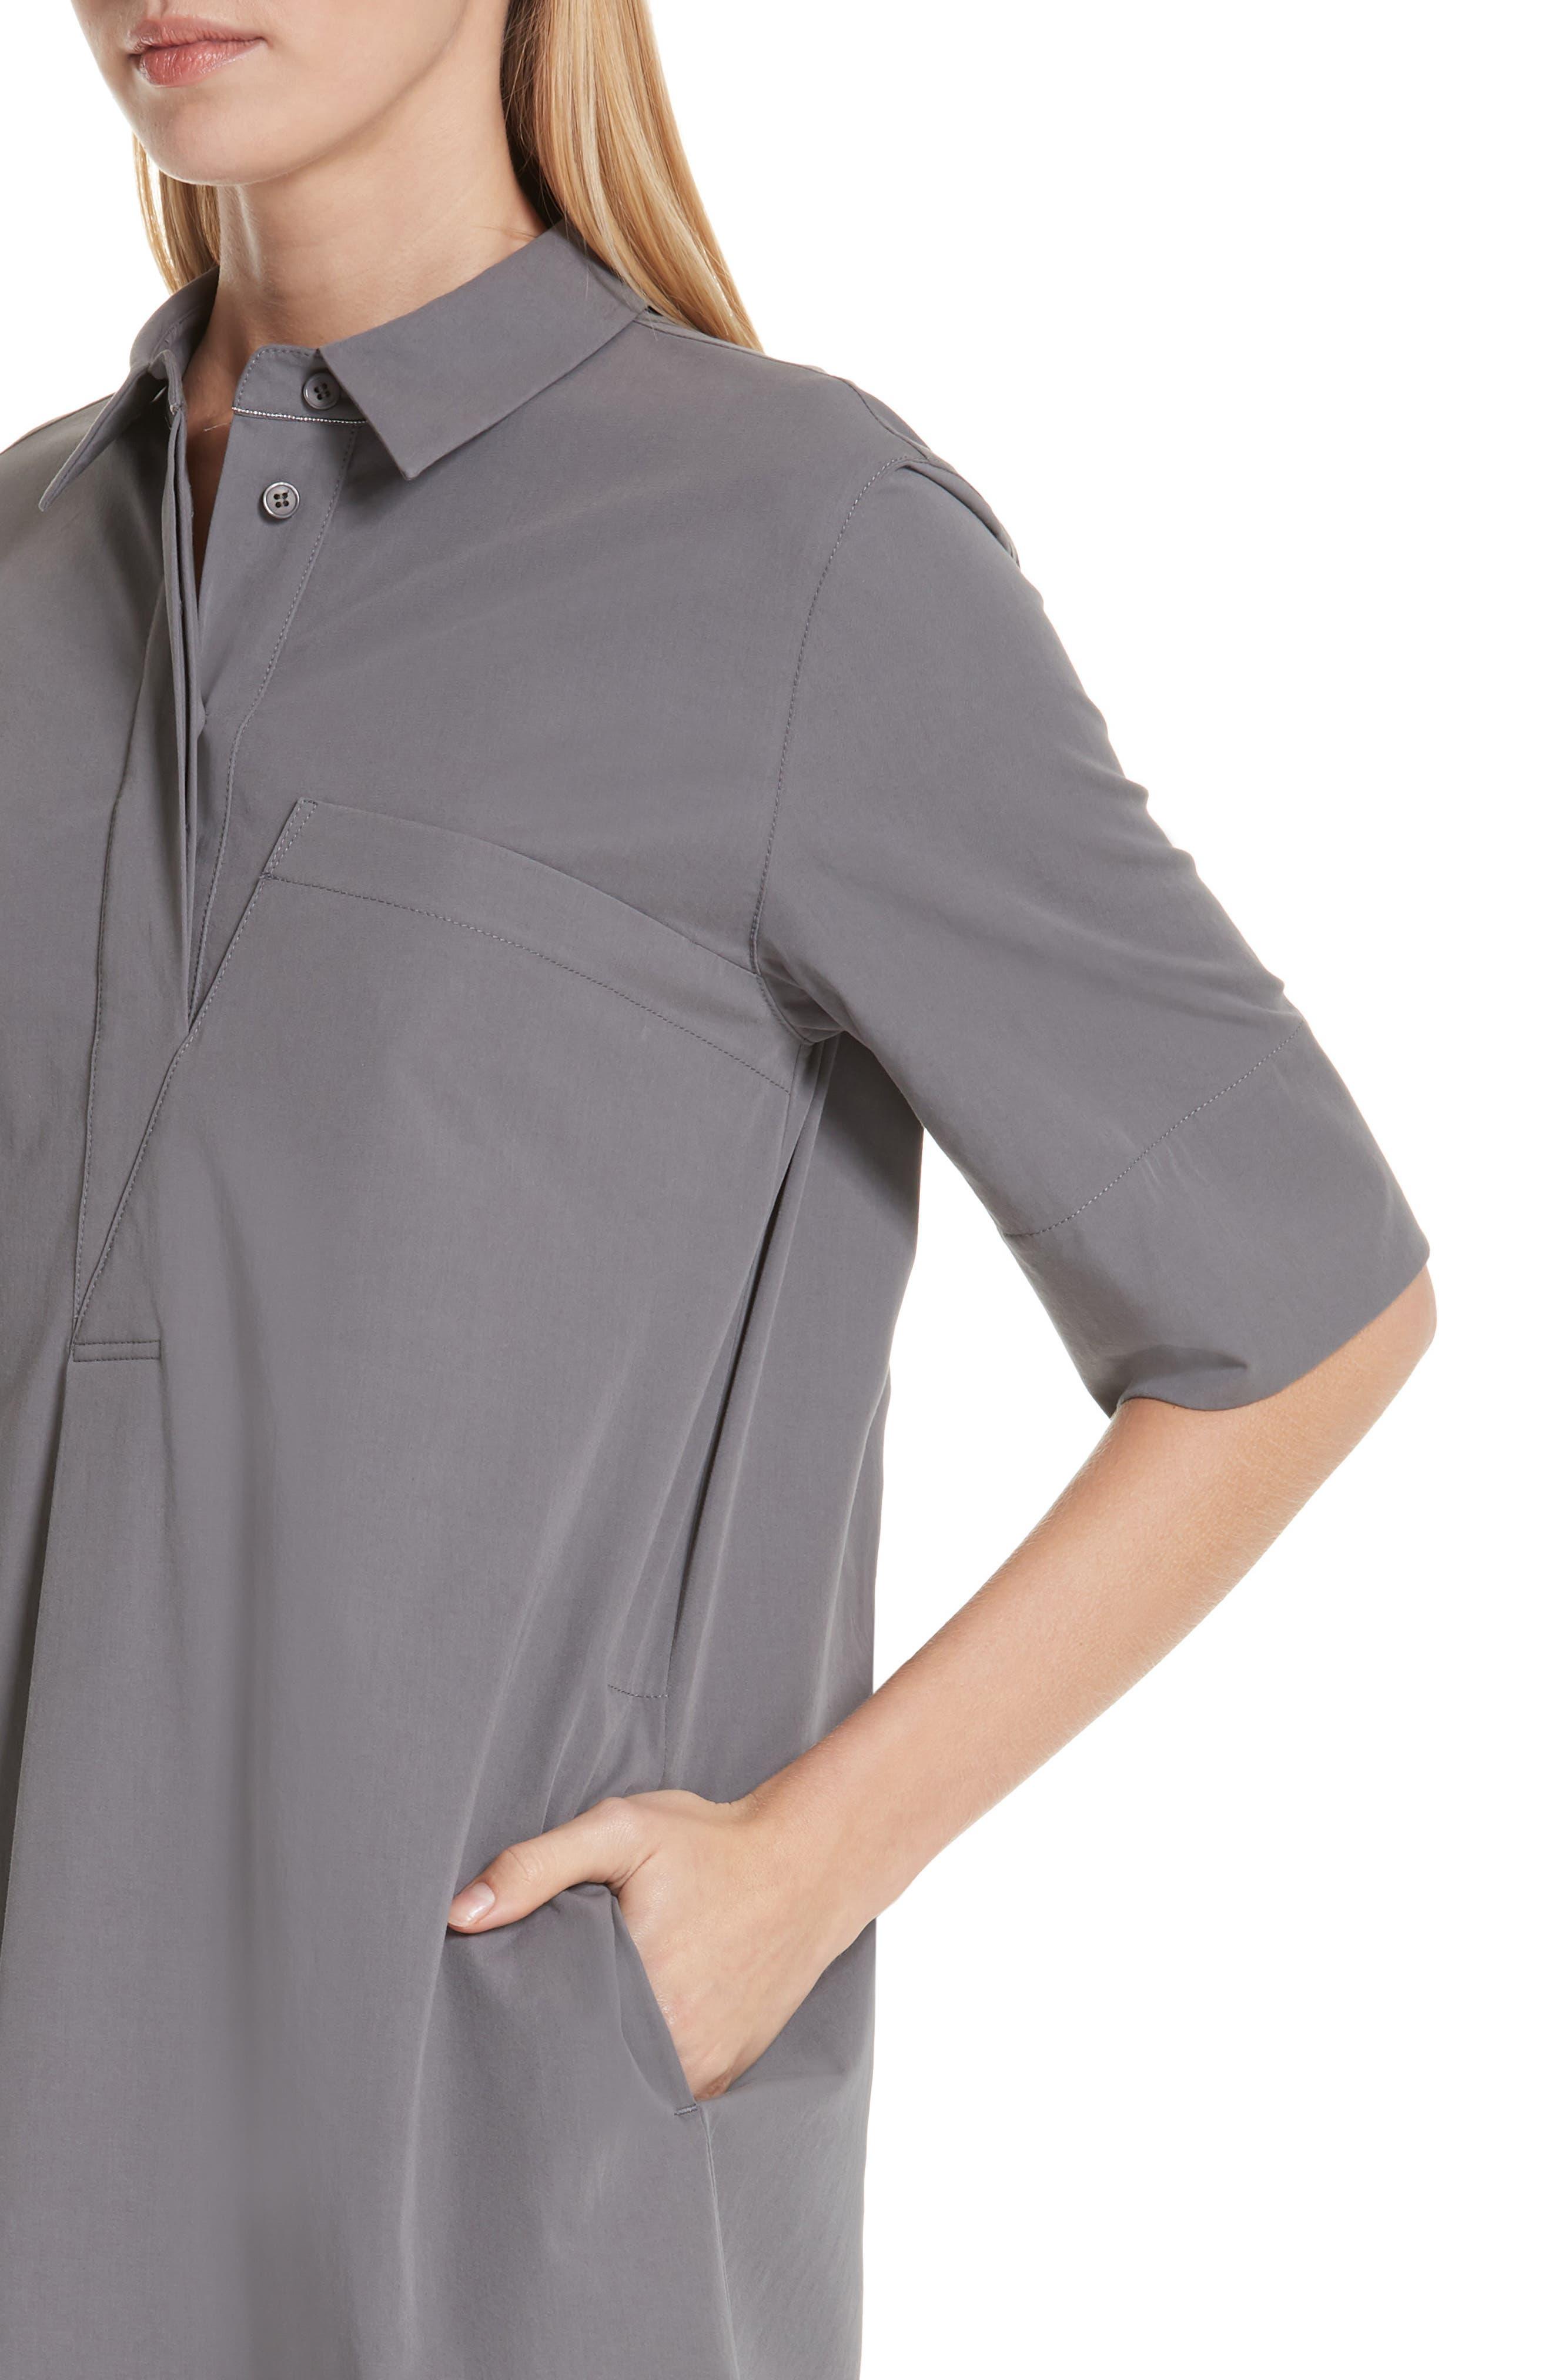 LAFAYETTE 148 NEW YORK, Casper Stretch Cotton Shirtdress, Alternate thumbnail 6, color, ROCK